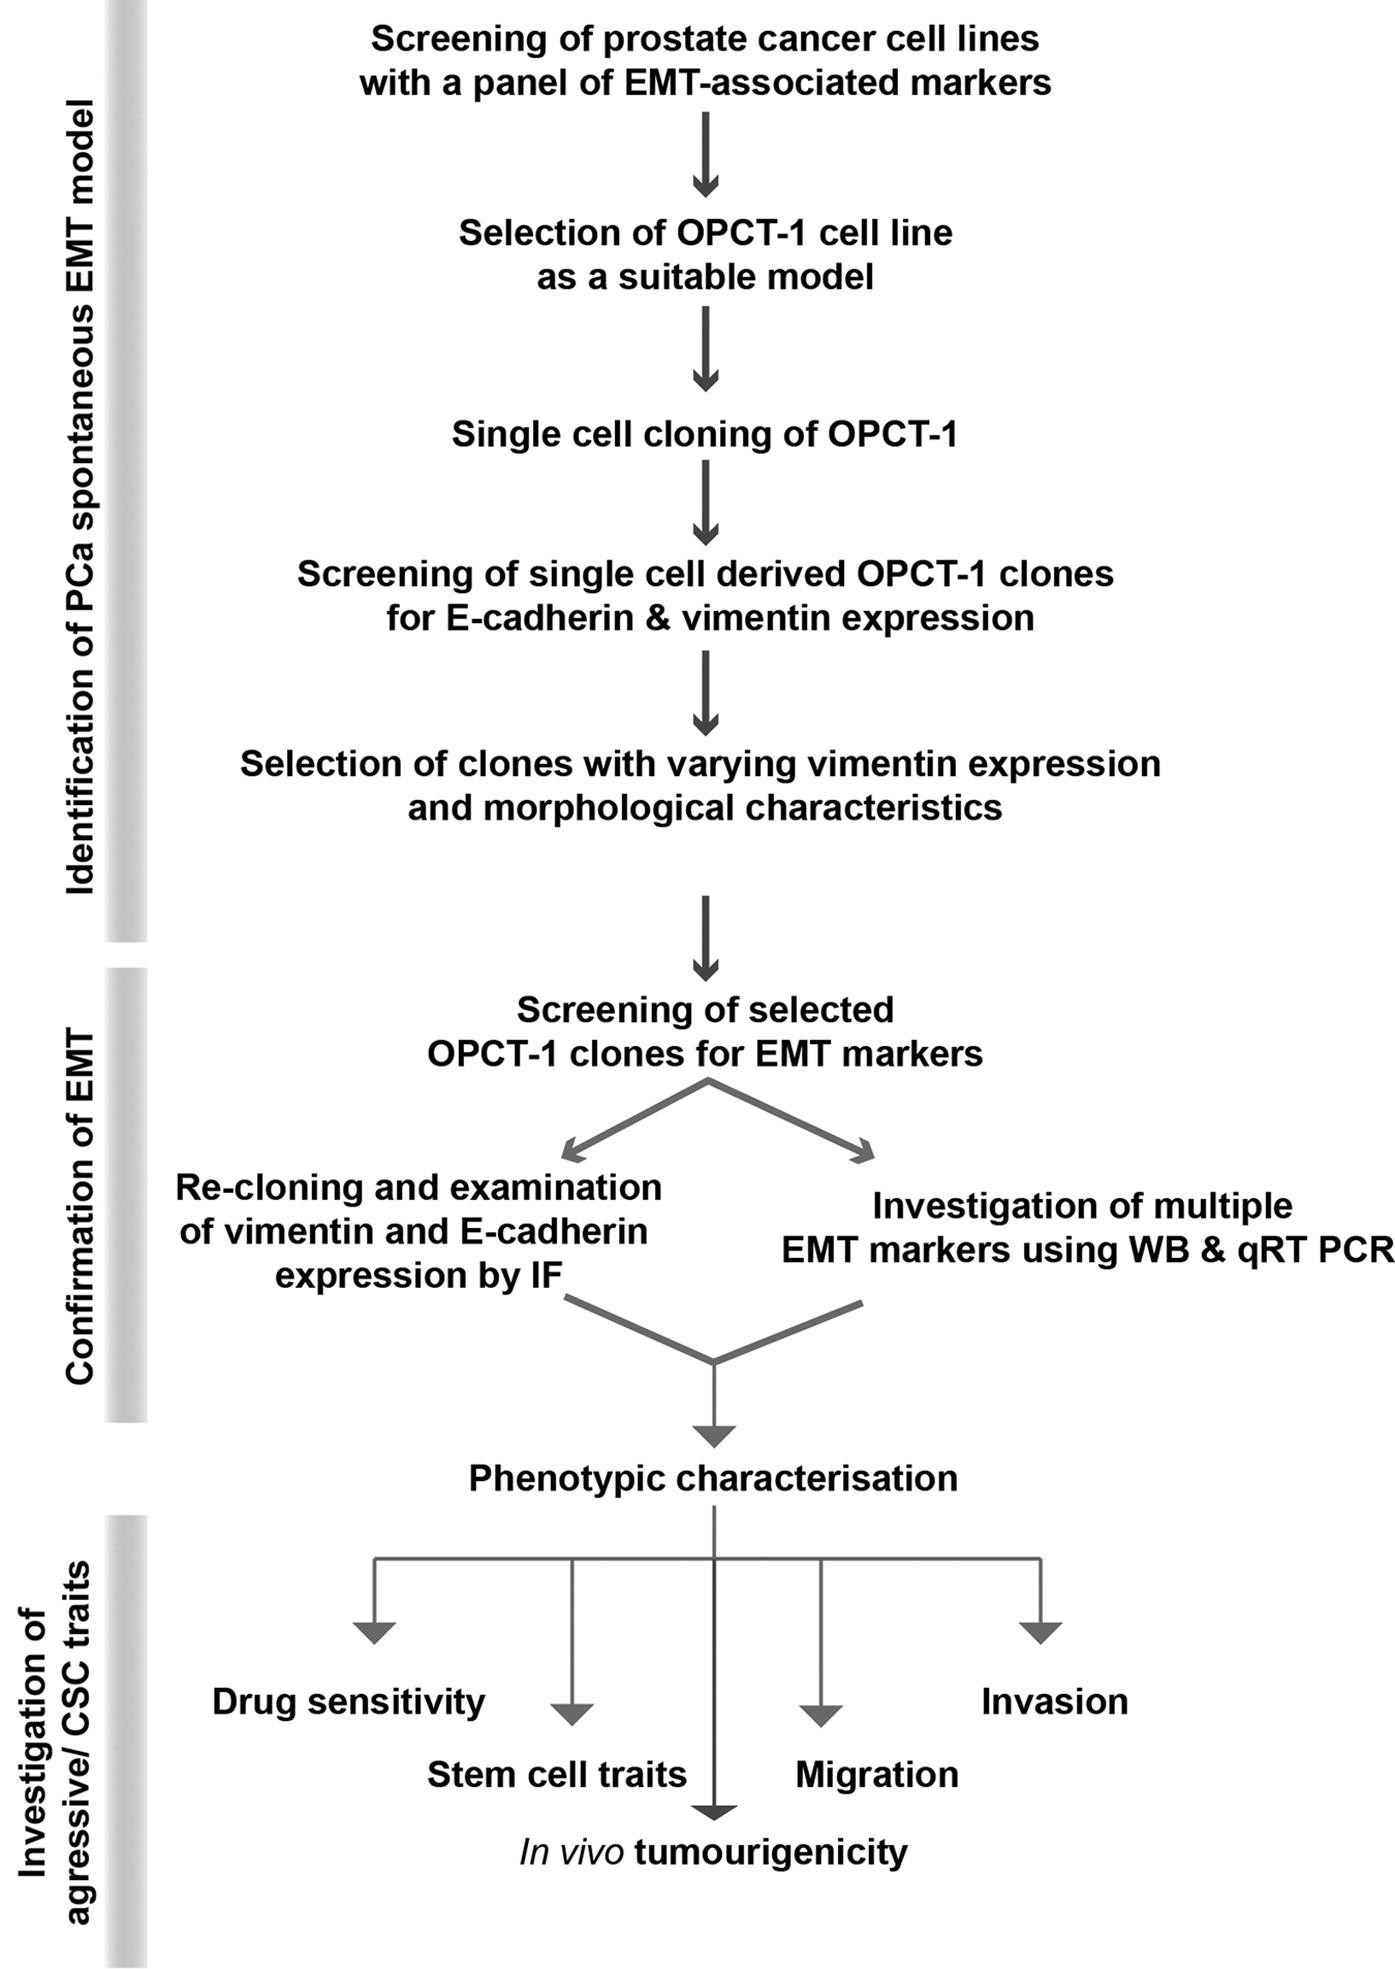 A Novel Spontaneous Model Of Epithelial Mesenchymal